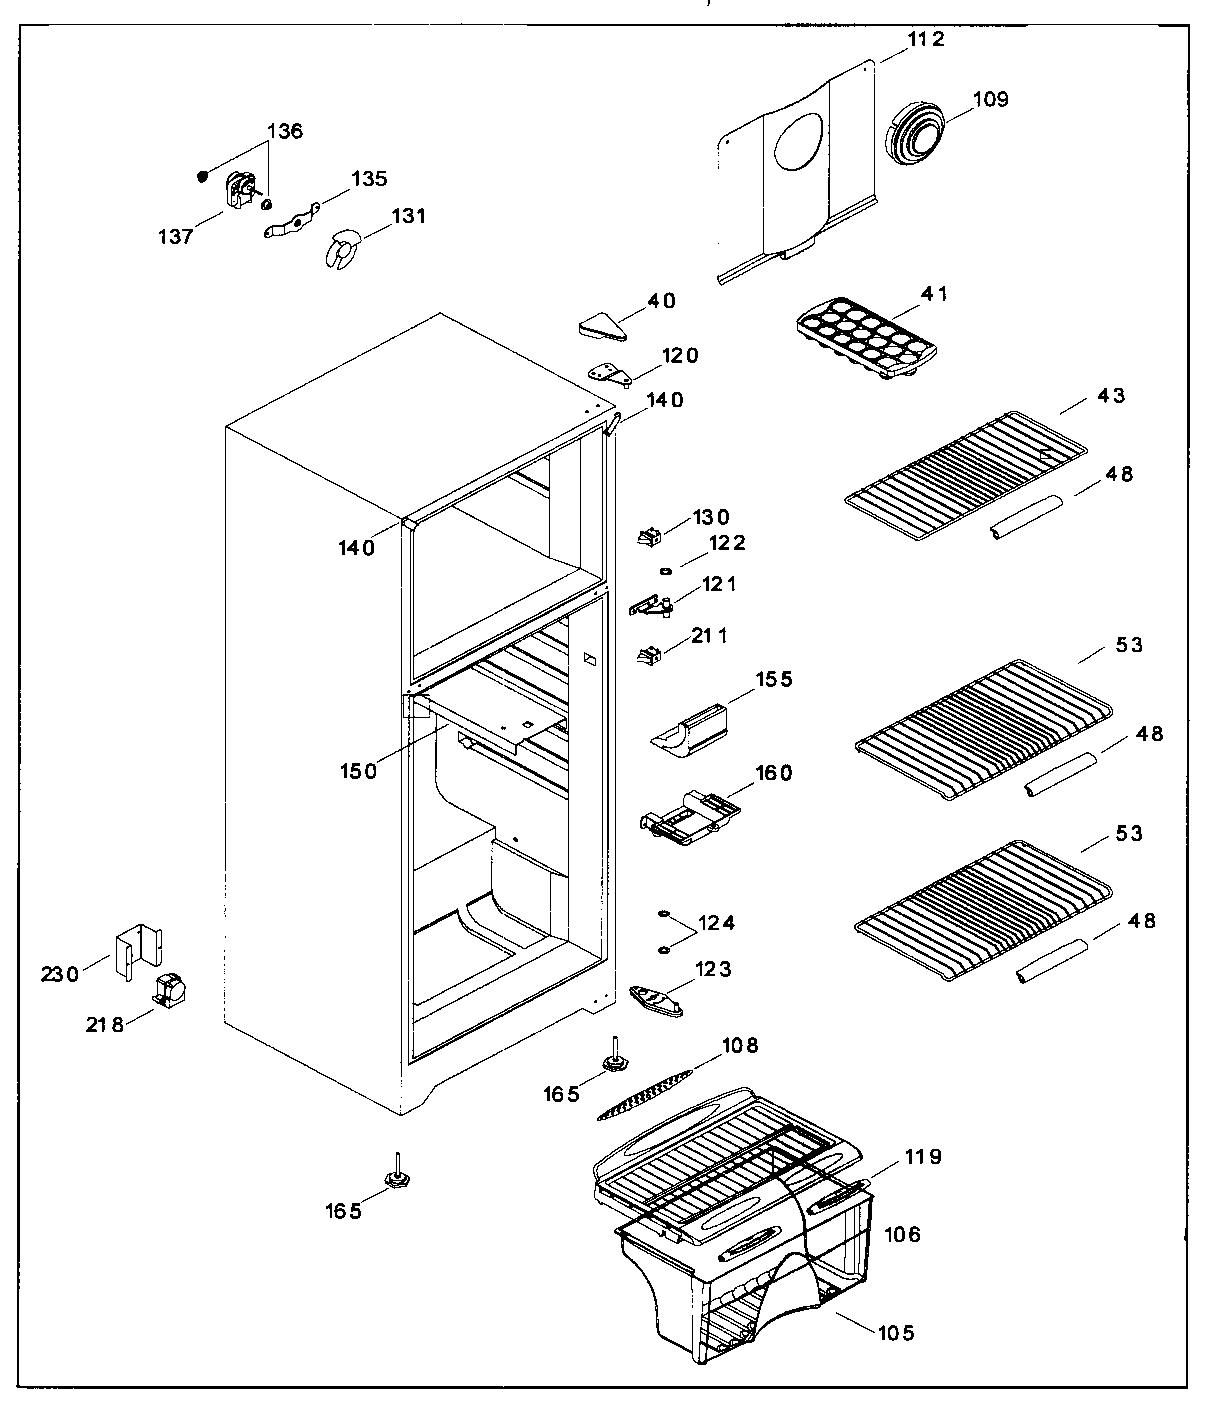 Danby Refrigerator Wiring Diagram, Danby, Get Free Image